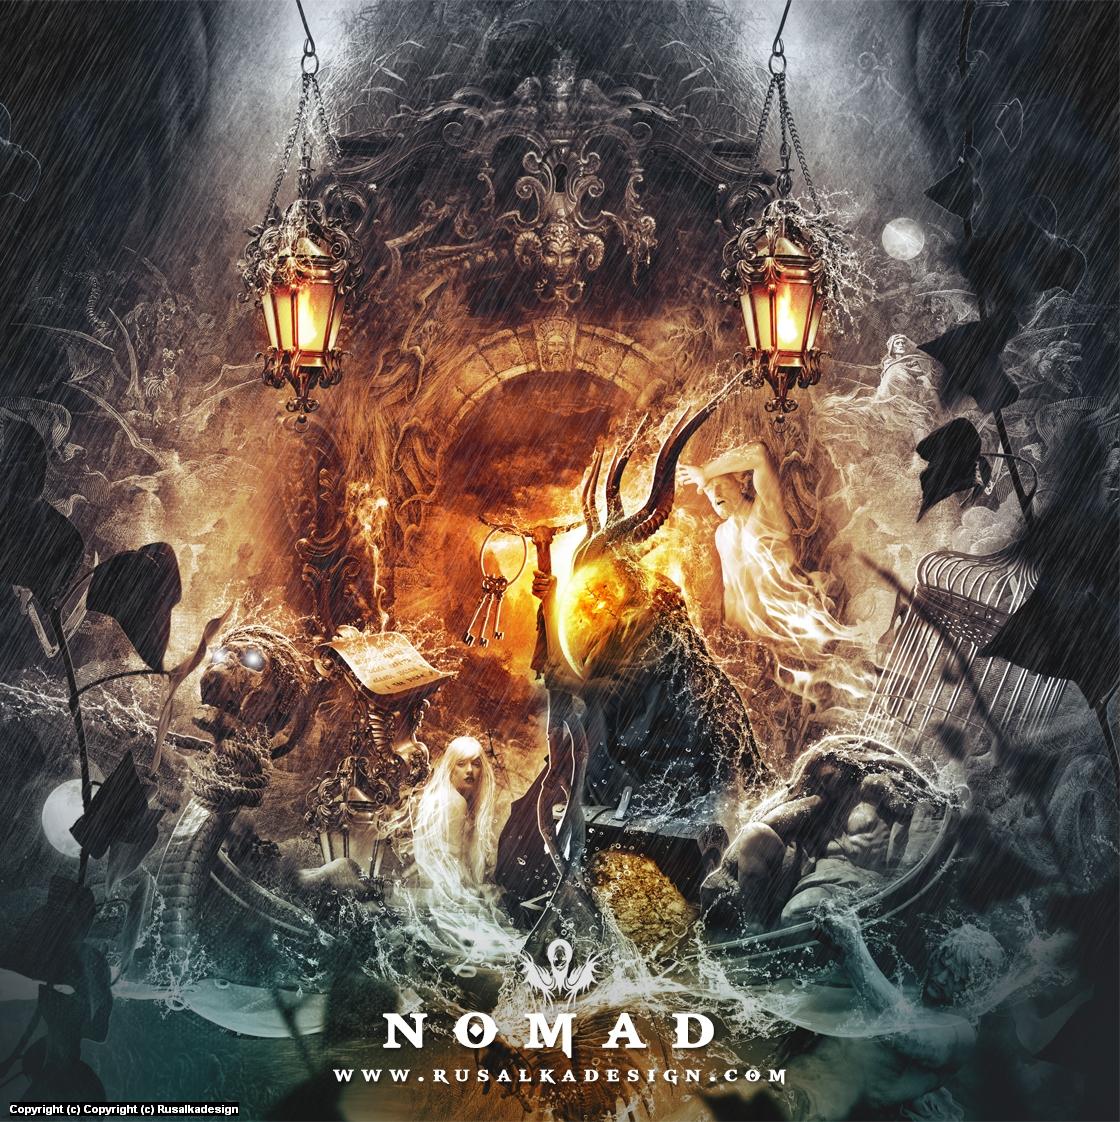 Nomad Artwork by Ludovic Cordelières